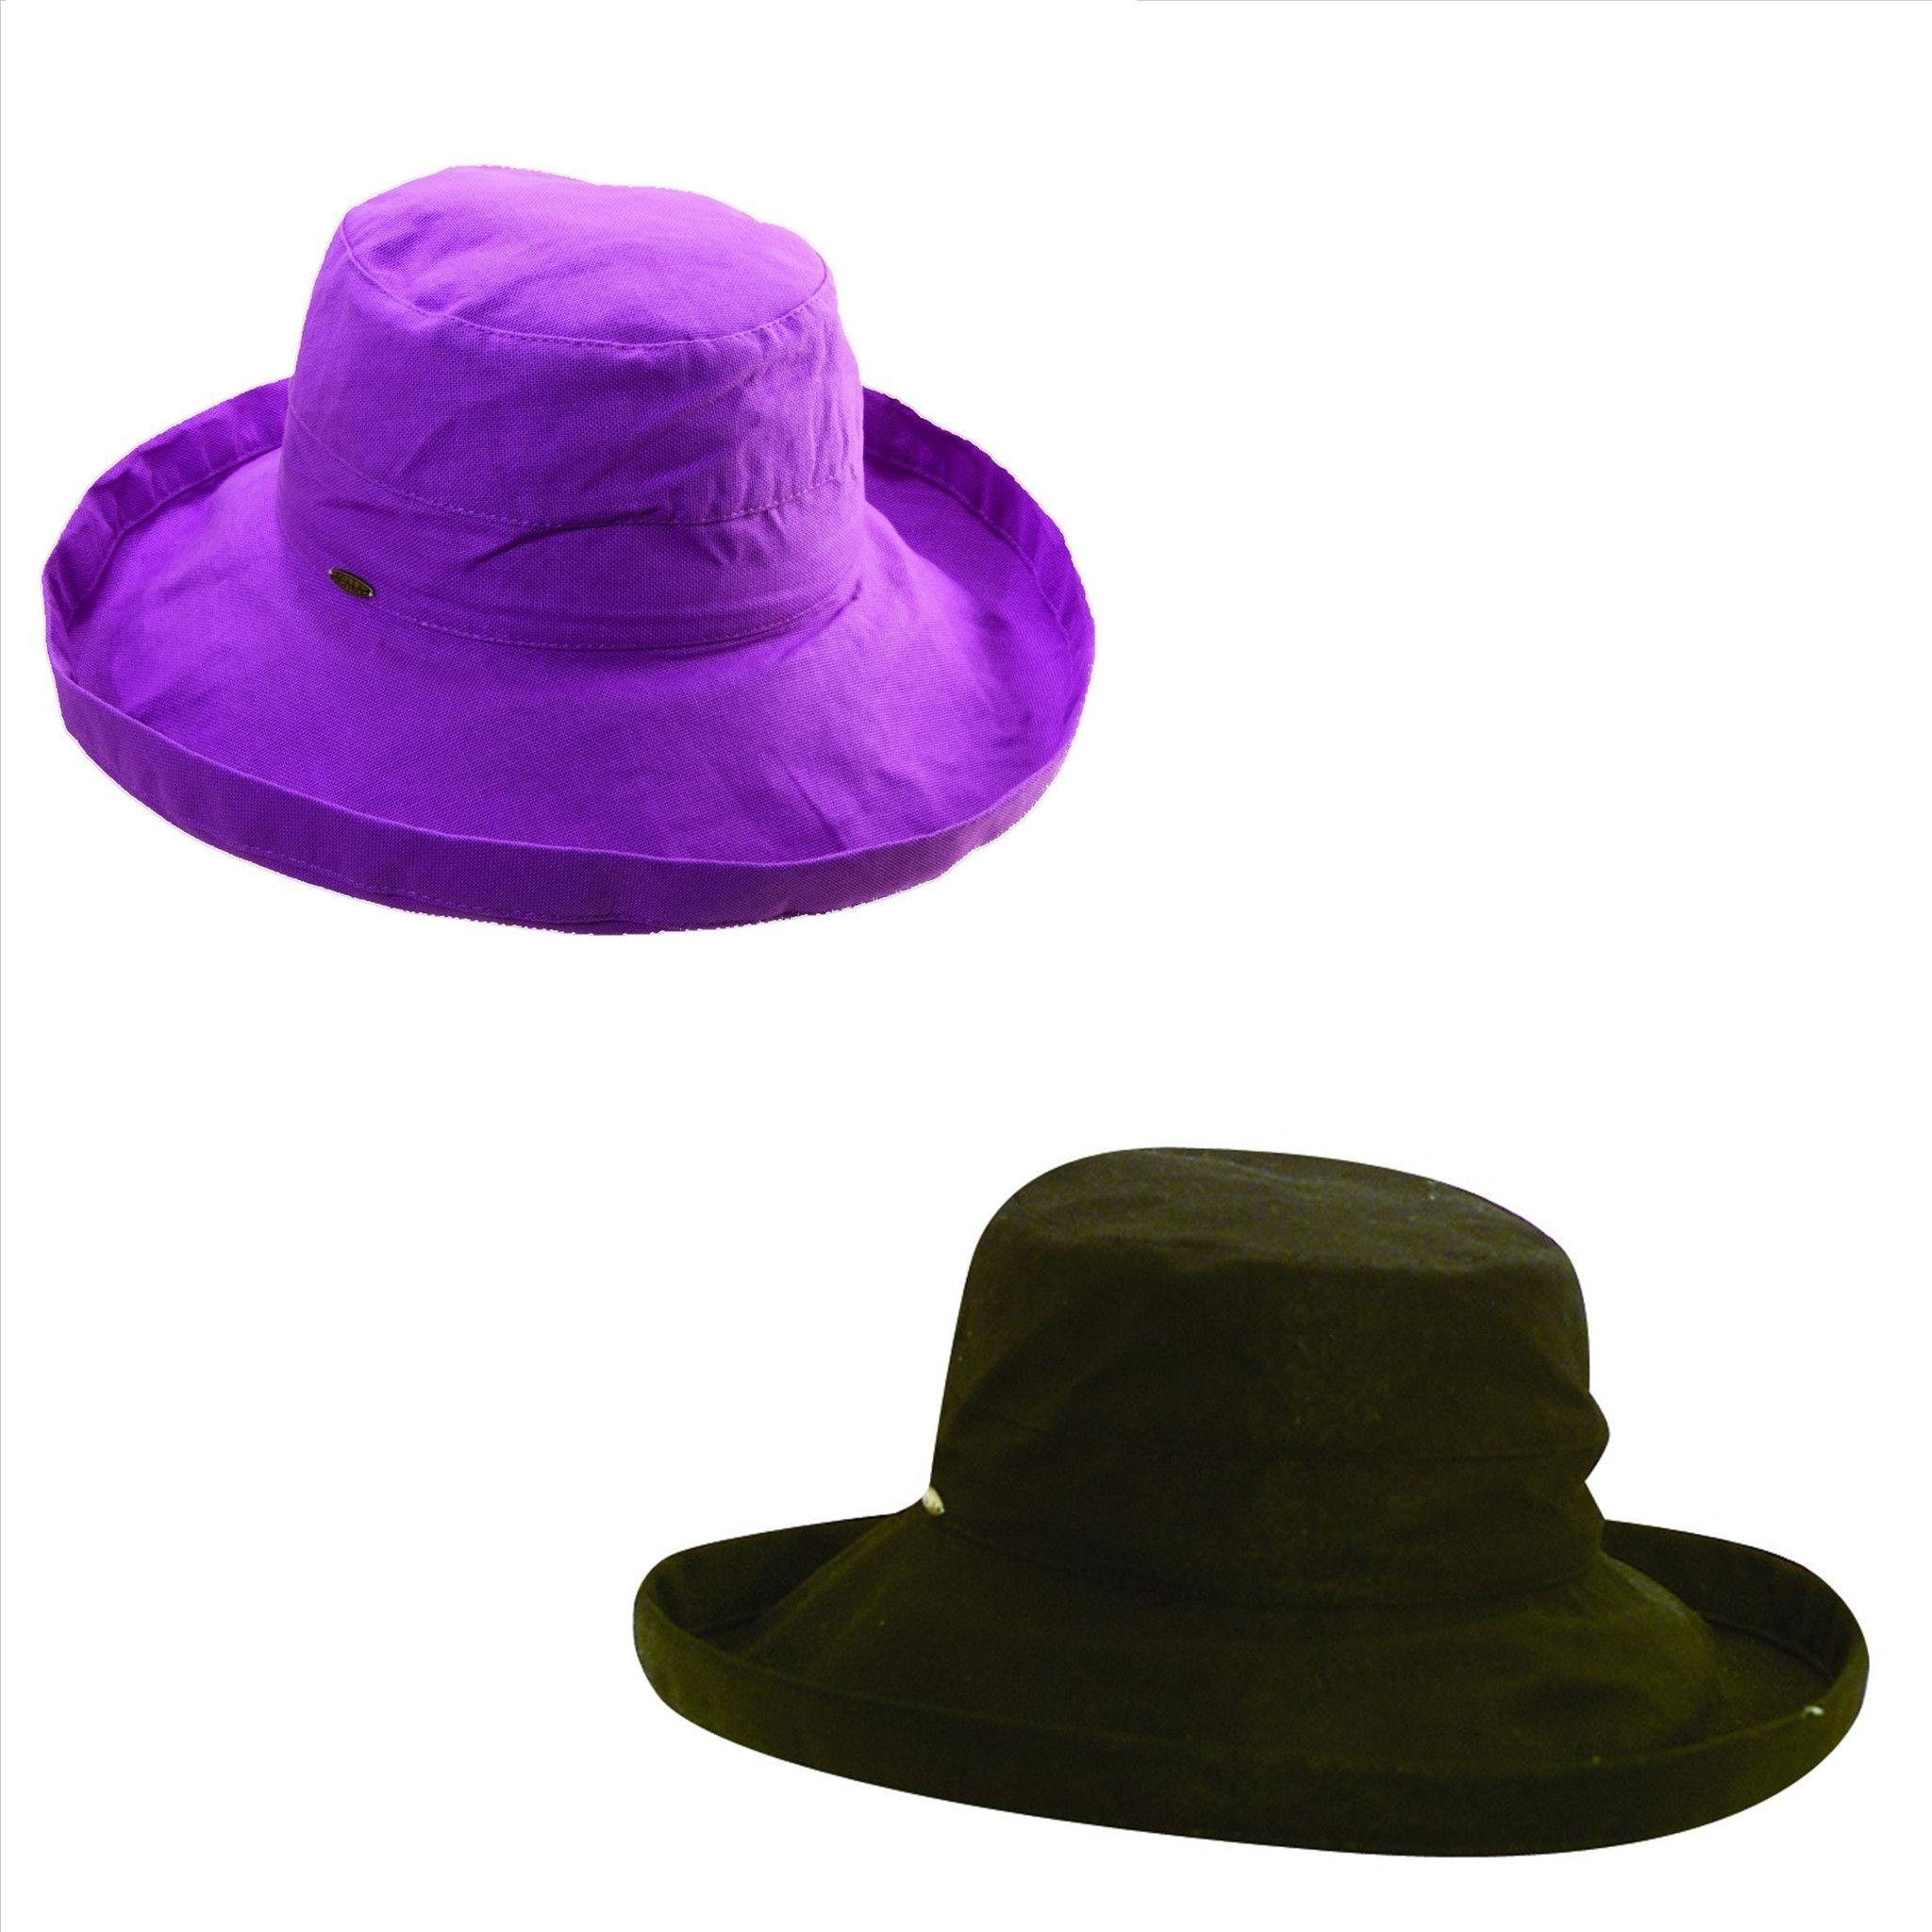 Scala Womens Cotton 4 Inch Brim UPF 50+ Hat (Pack of 2)